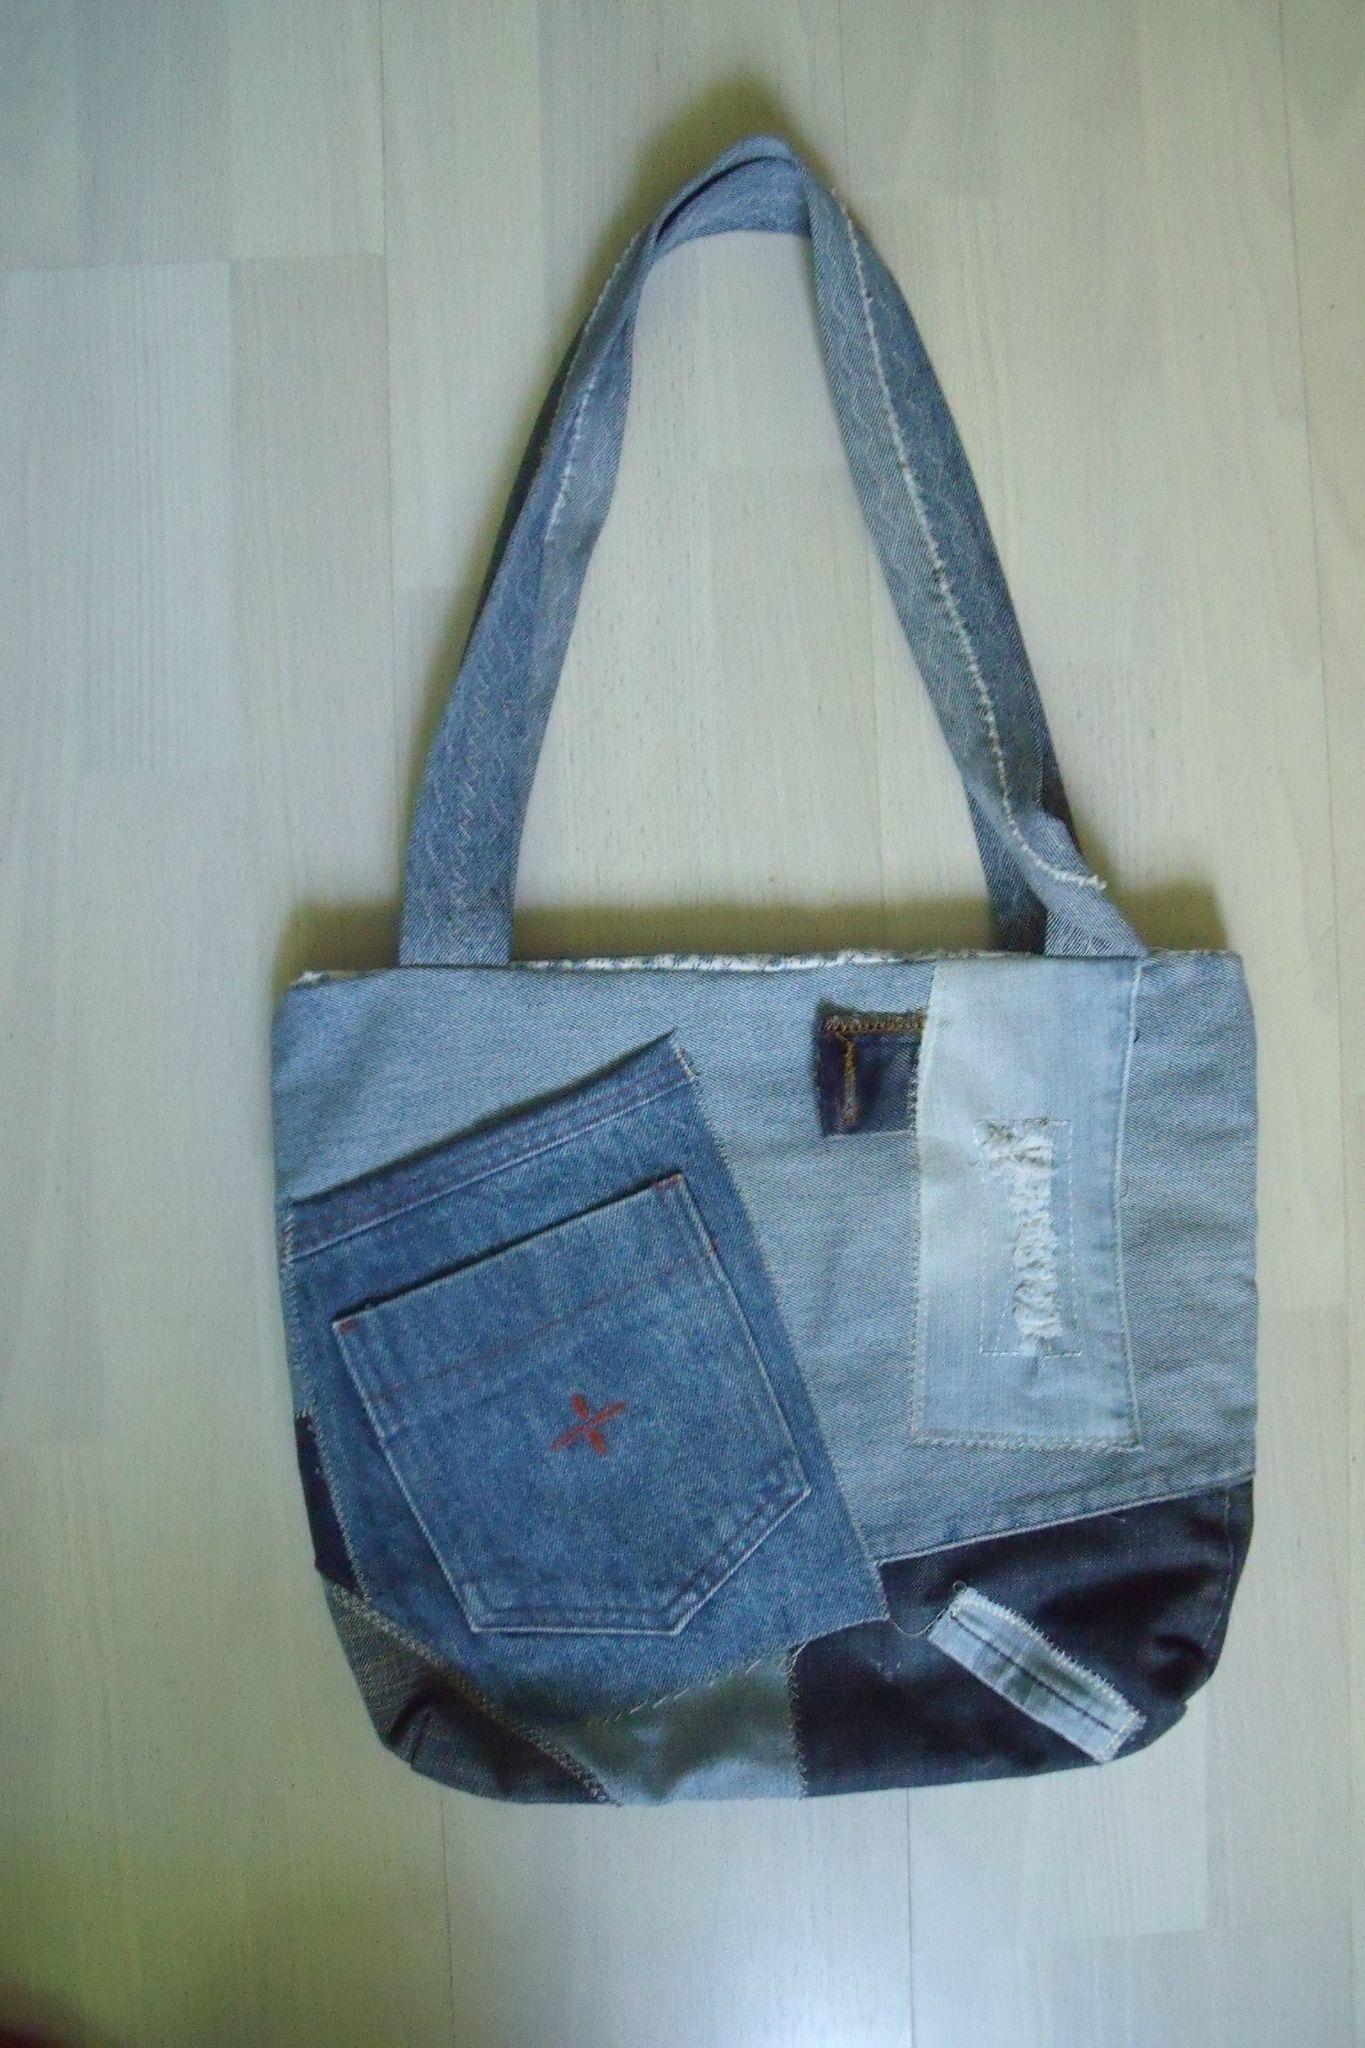 sac jeans 1 devant